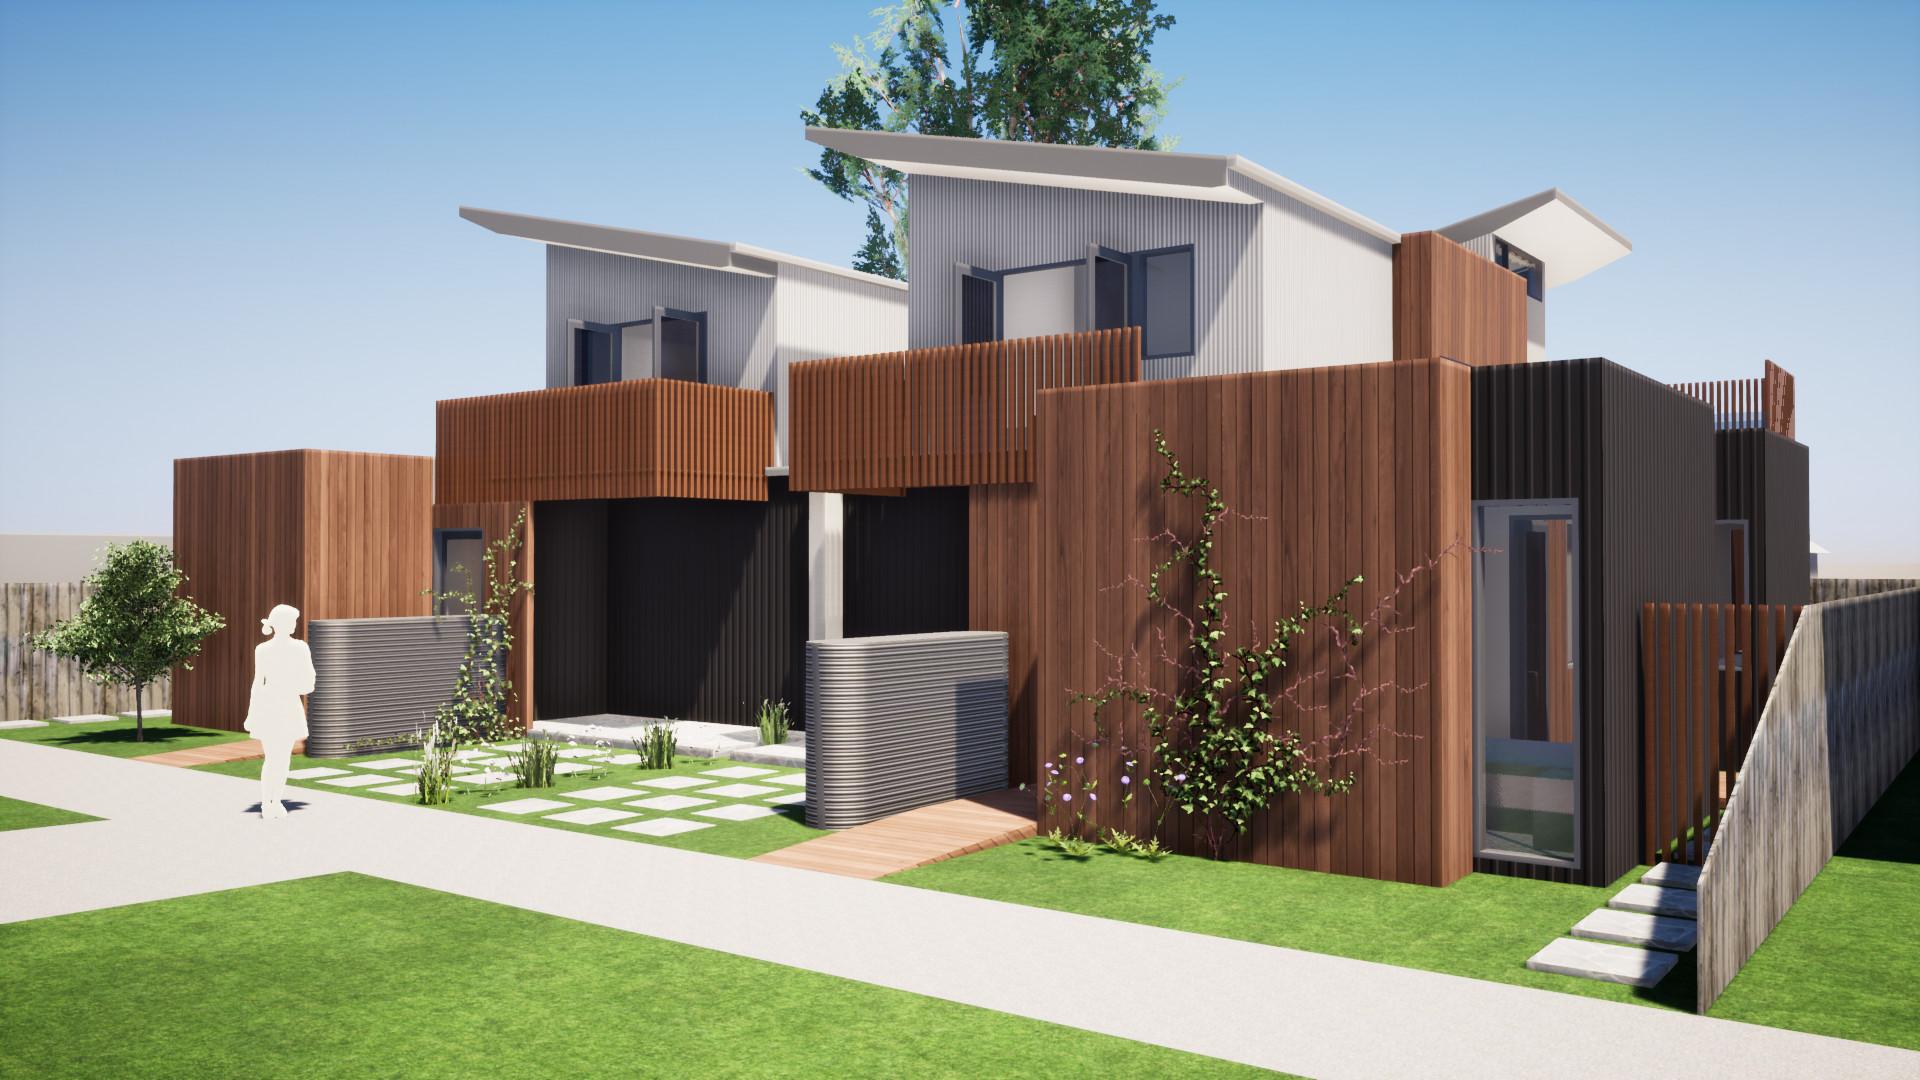 top bendigo architects sun townhouses spandek metal cladding multi residential development